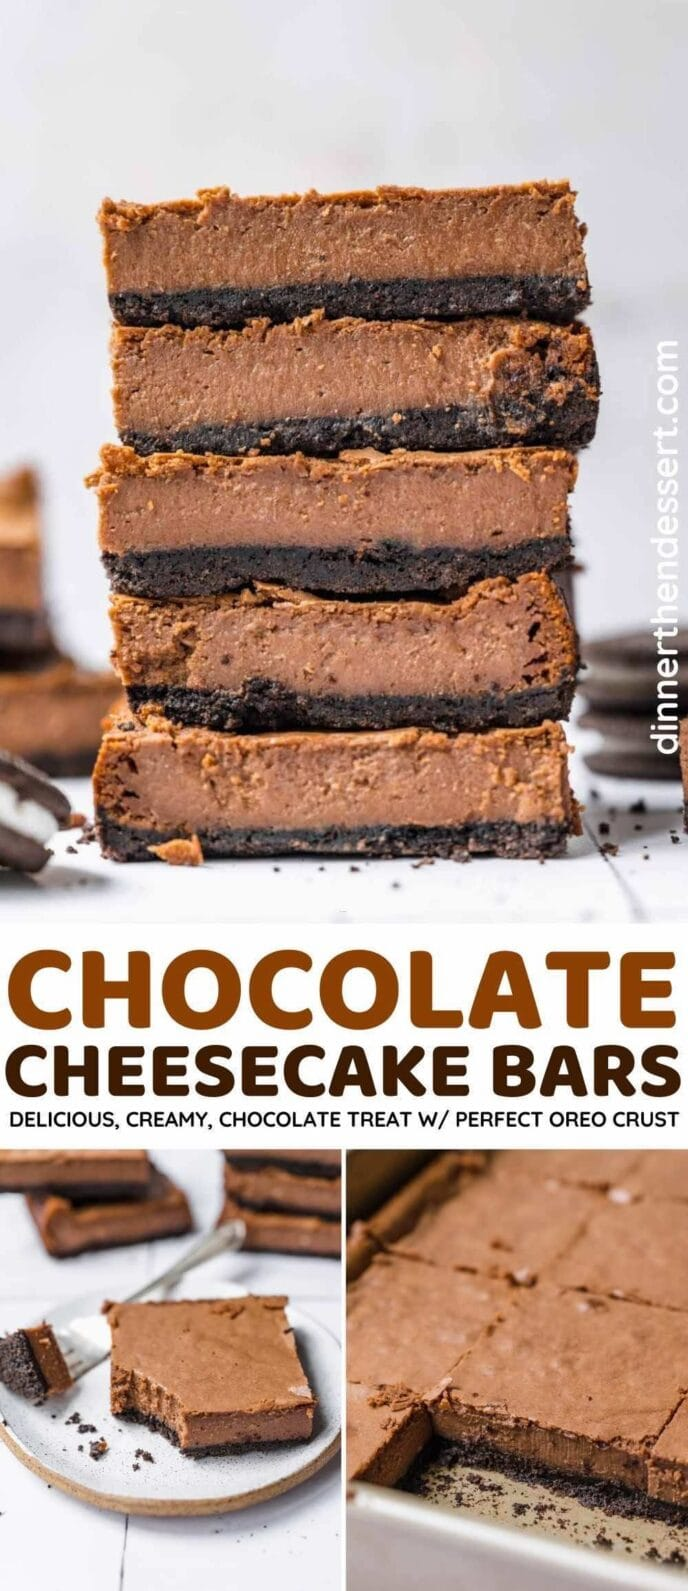 Chocolate Cheesecake Bars collage